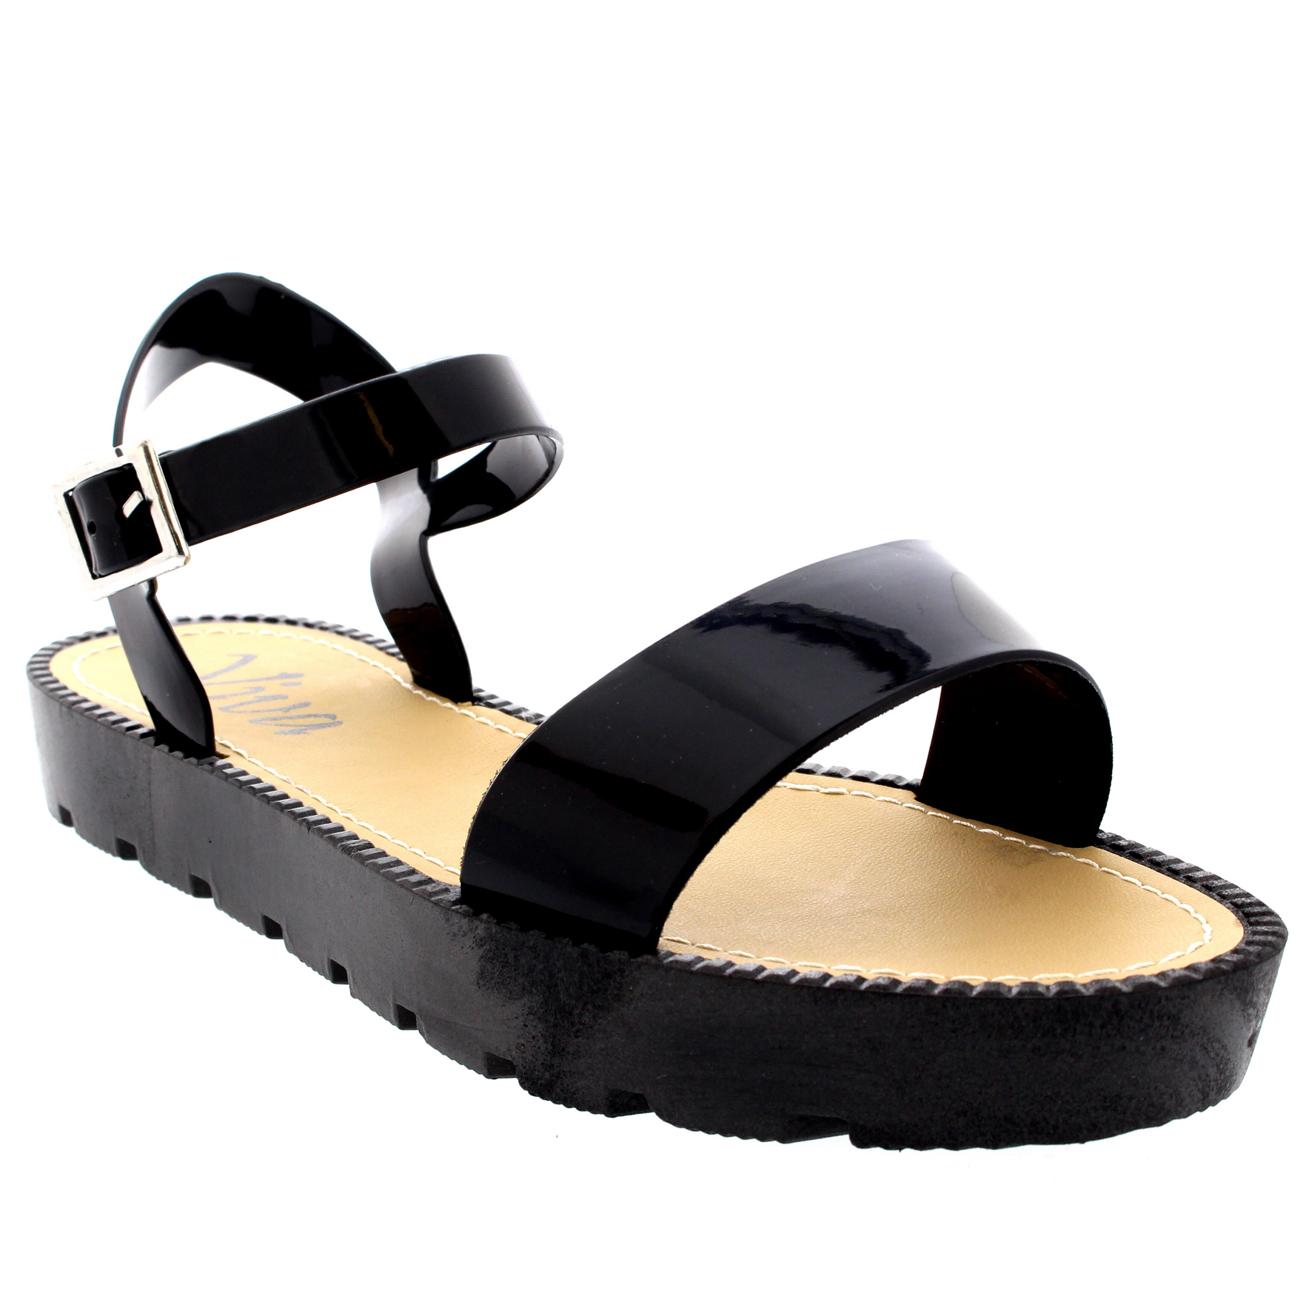 Womens Flatform Buckle Wedge Holiday Festival Peep Toe Ankle Strap Sandal UK 3-9